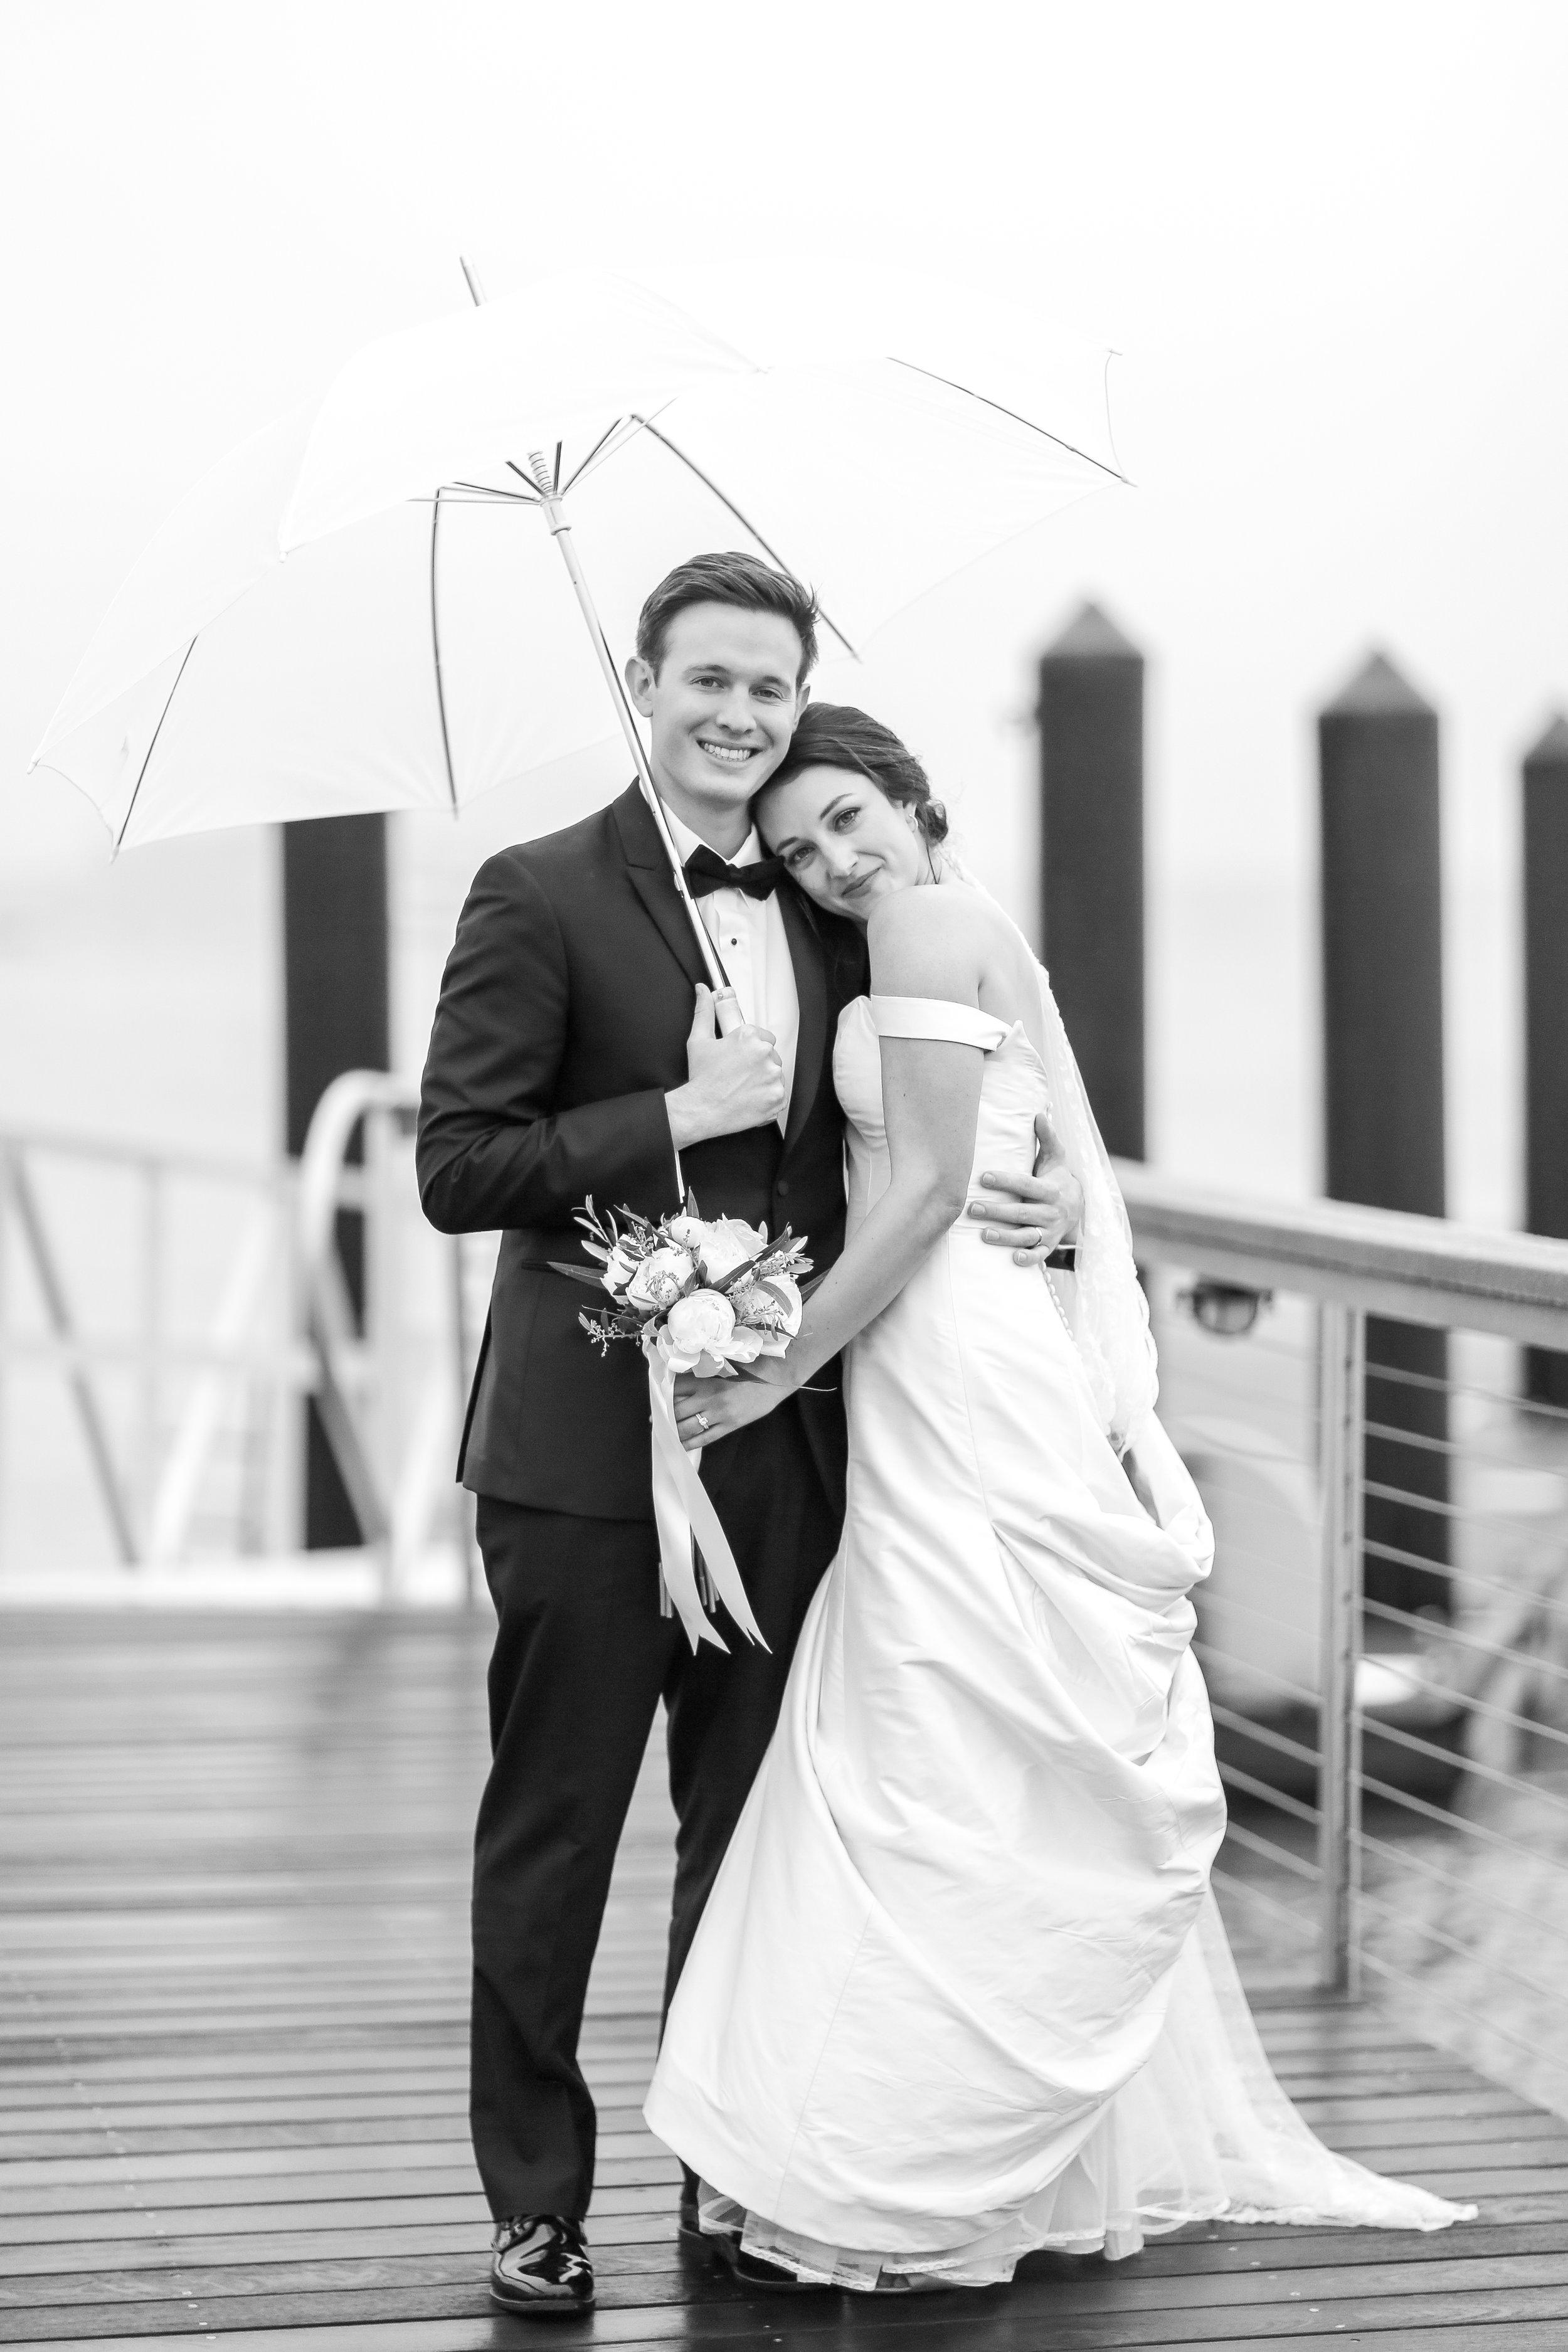 Jeremie_Barlow_Photography_Steffen_Sudyam_wedding_2018-692.jpg